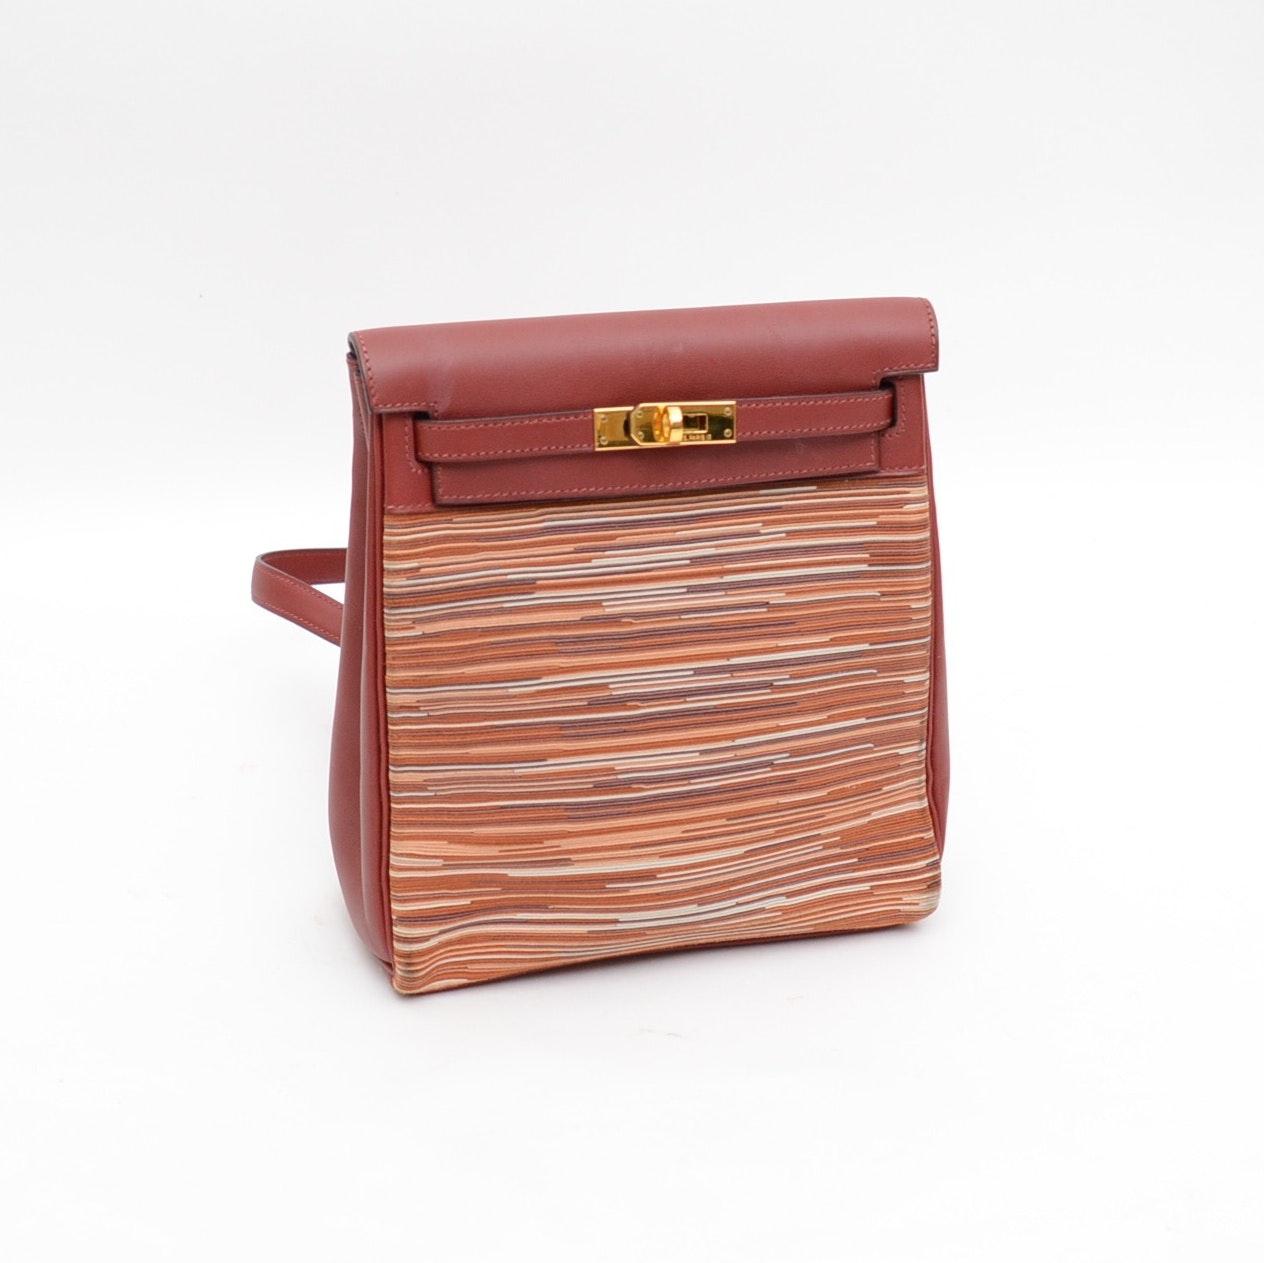 2001 Hermès of Paris Vibrato Box Leather Kelly Ado 20CM Backpack Purse